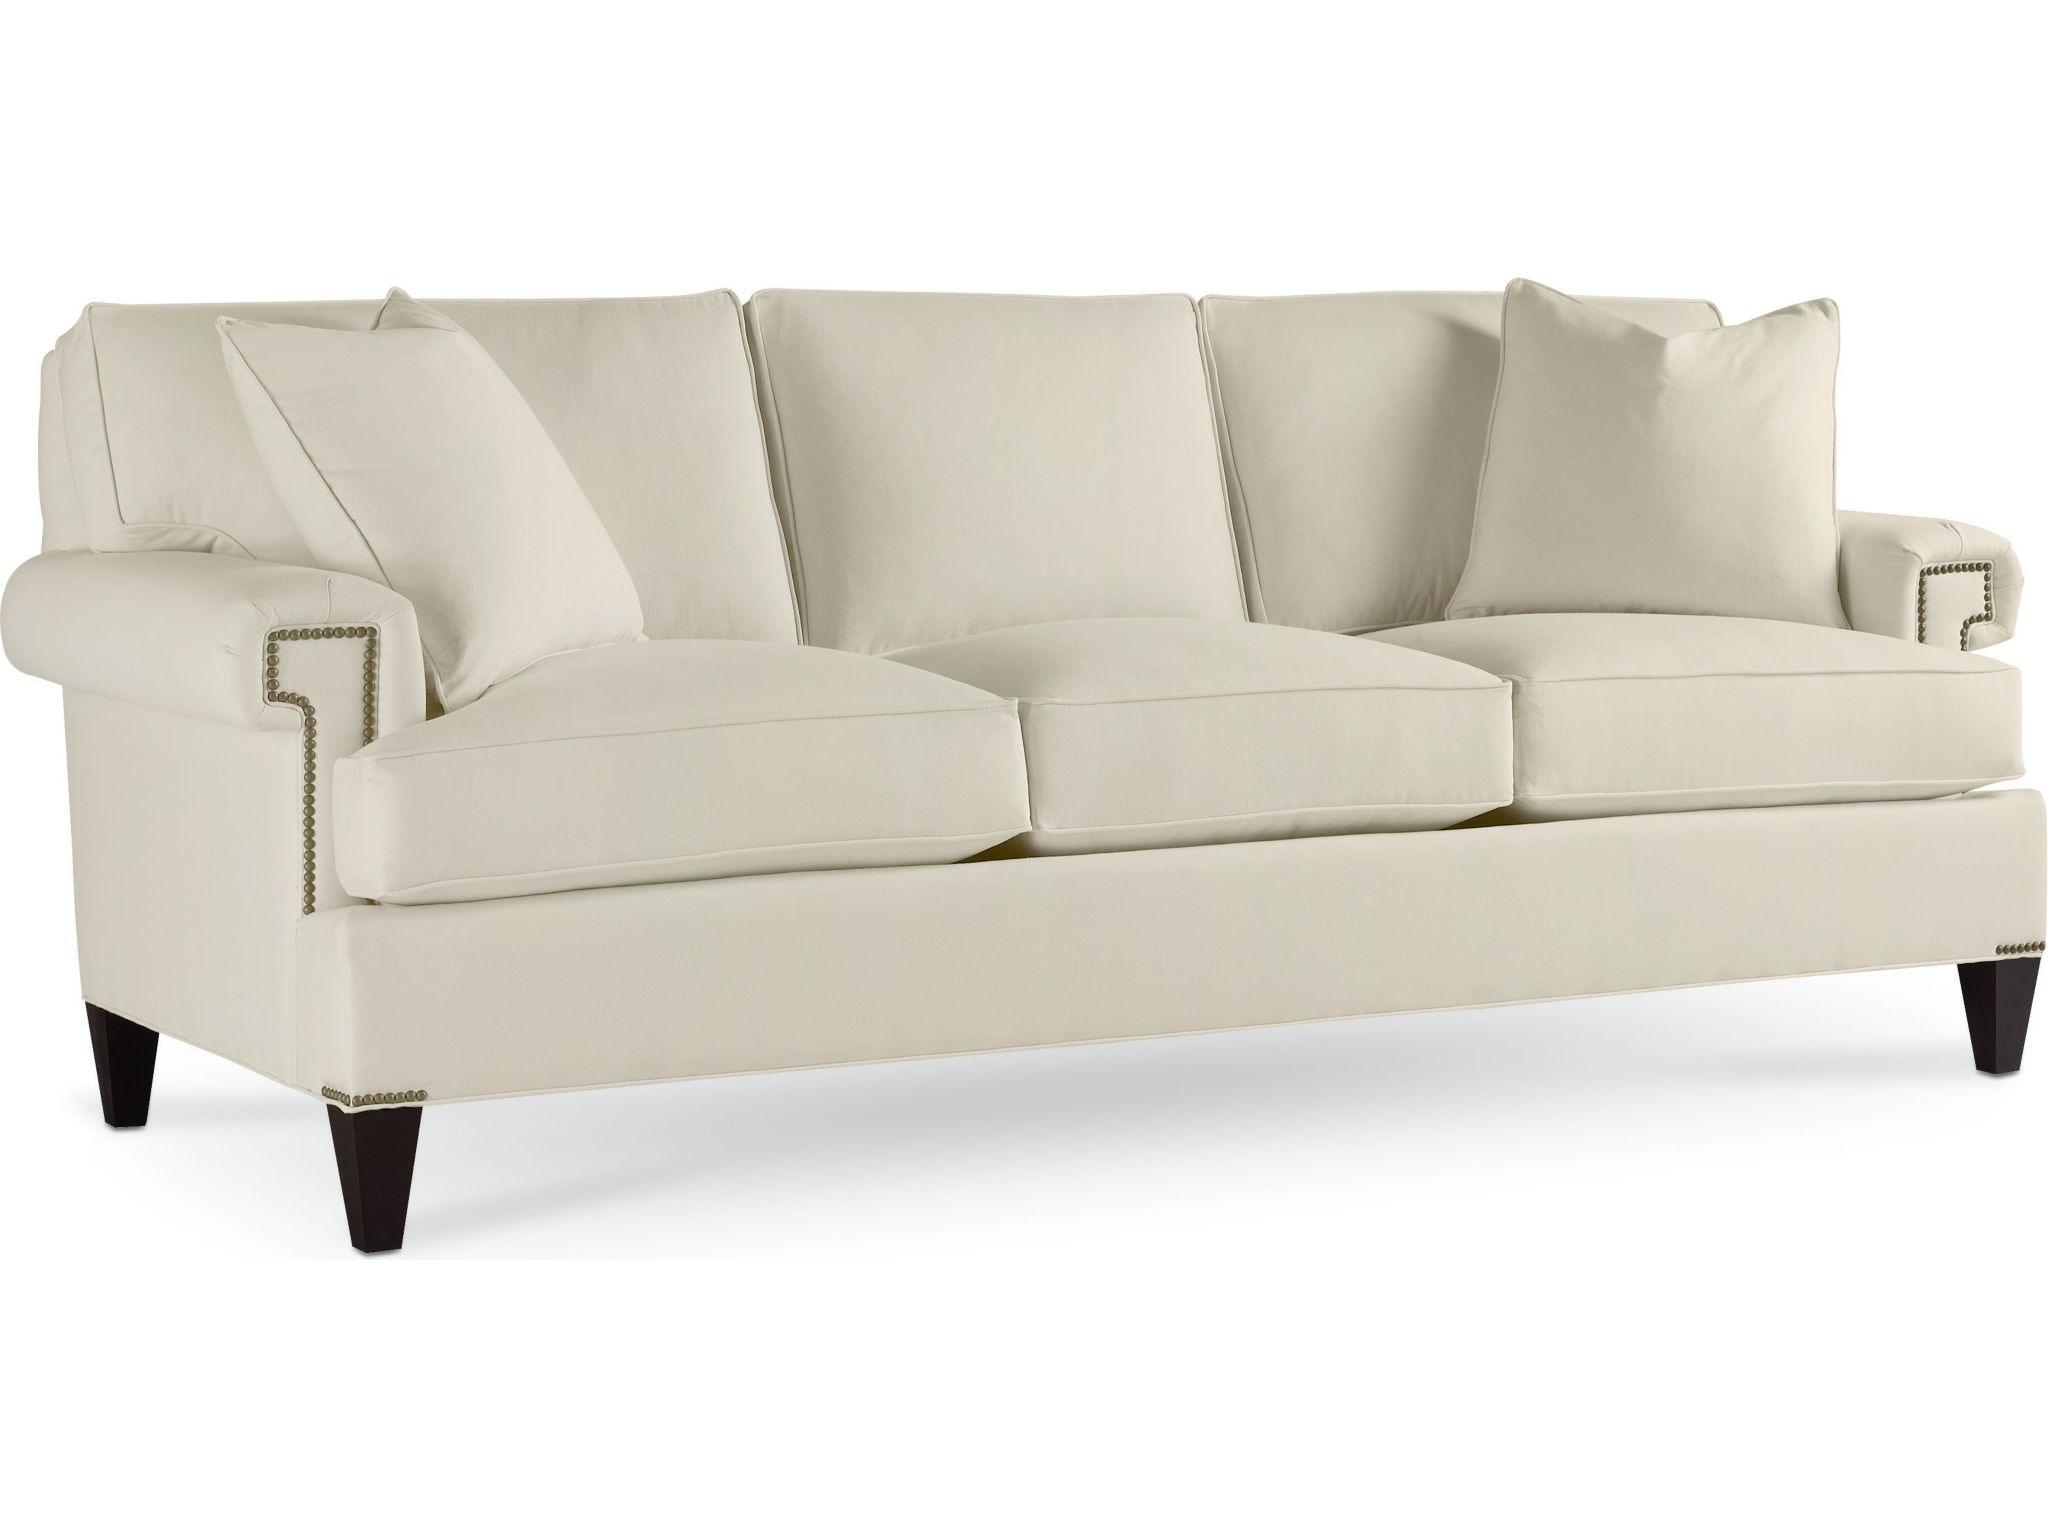 2237 11. Alvery Sofa